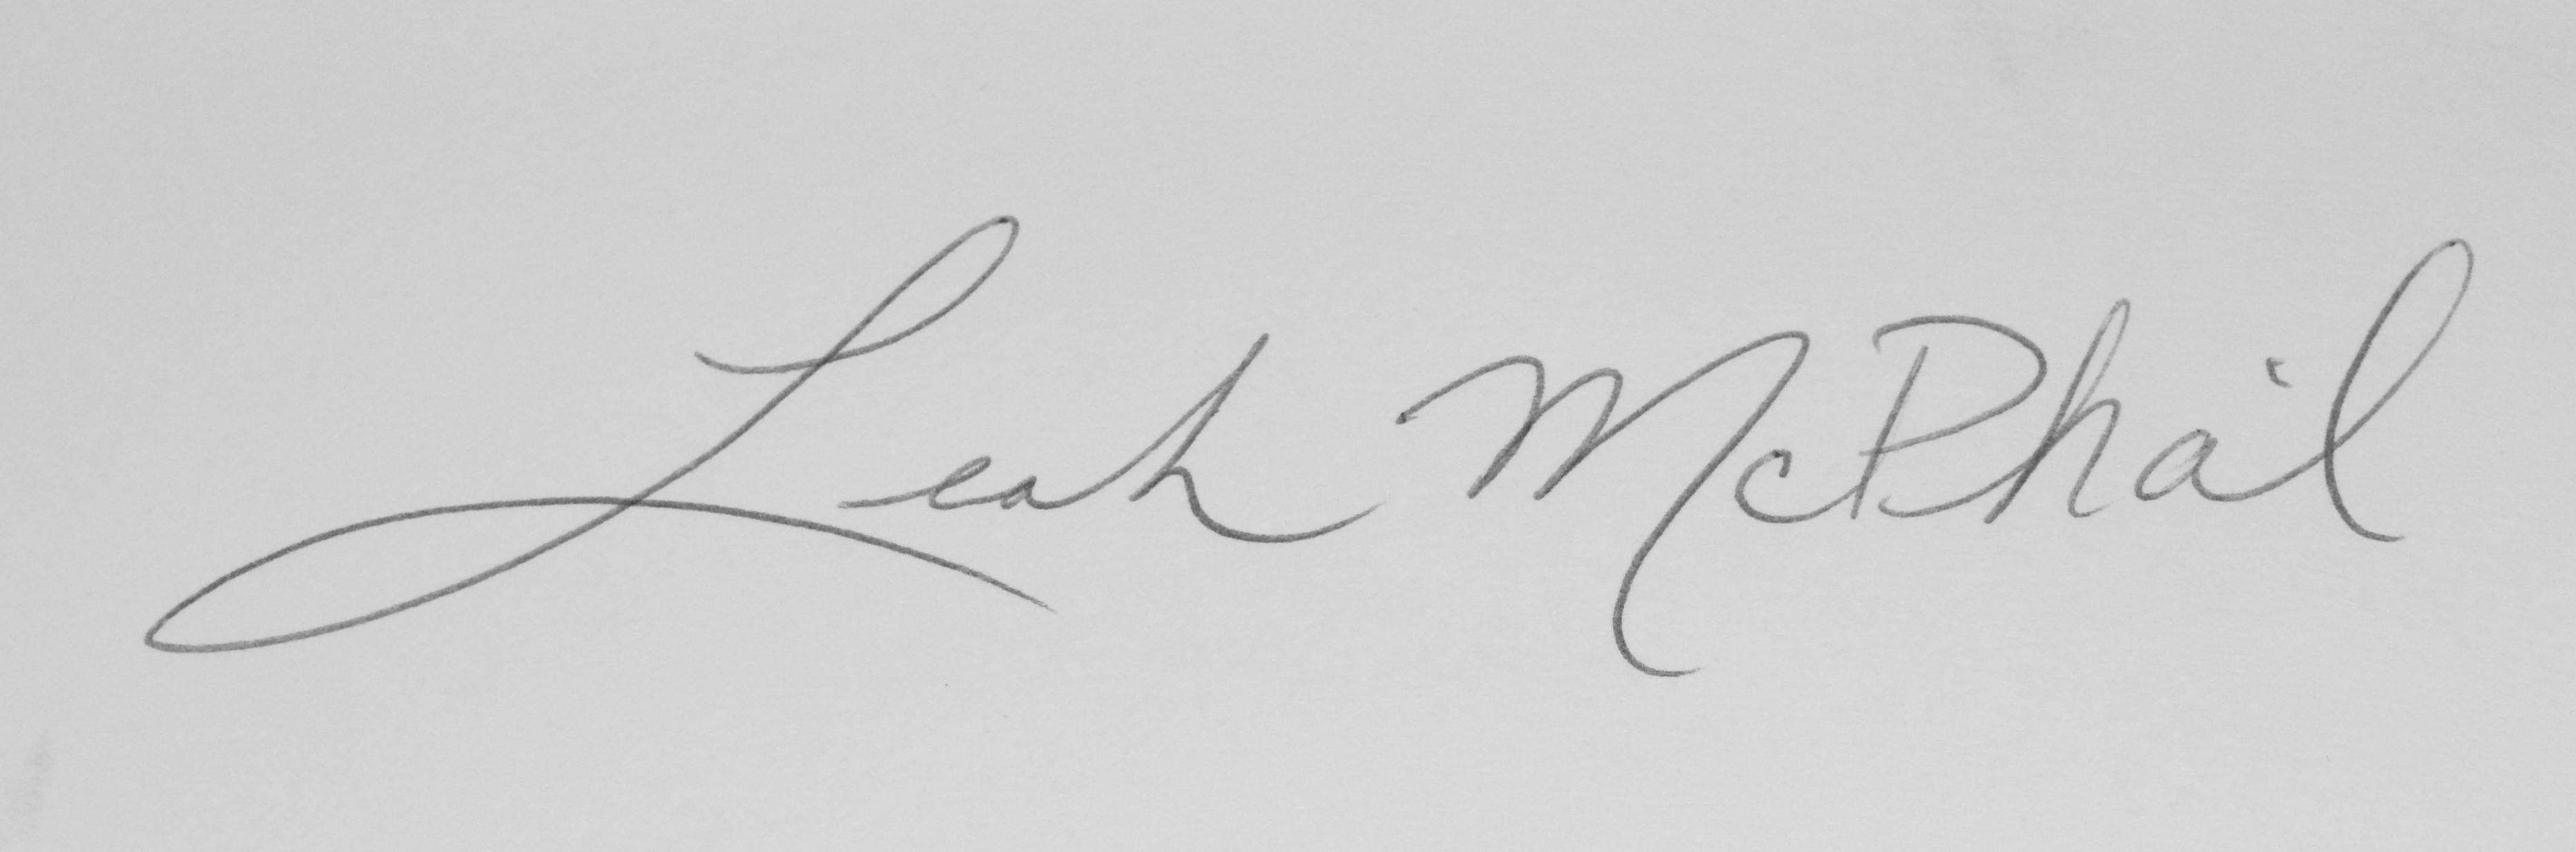 Leah McPhail's Signature